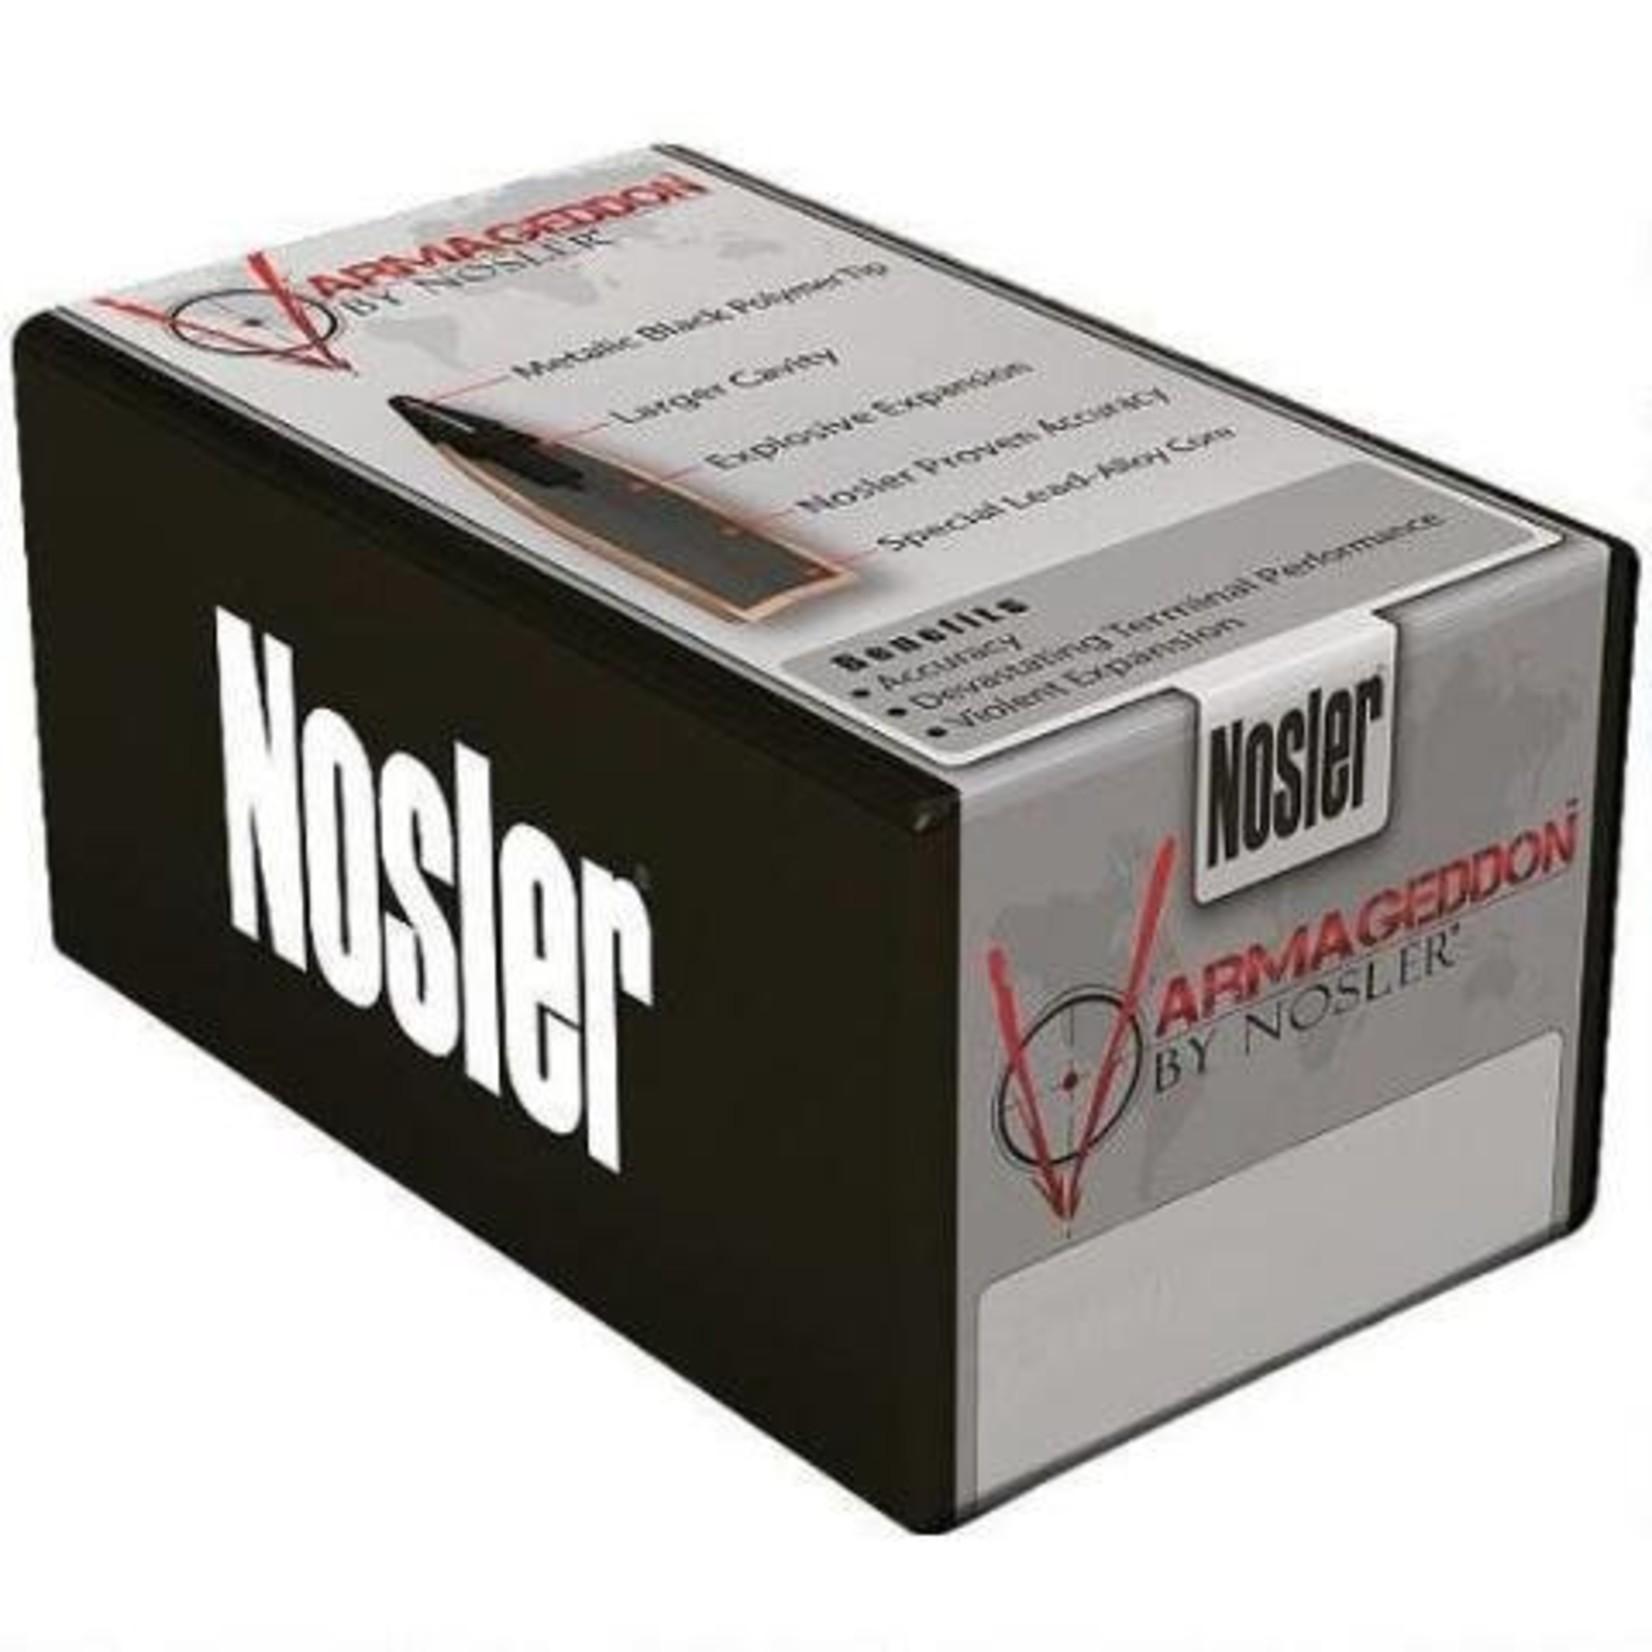 "Nosler Varmageddon .20 Caliber .204"" Diameter 32 Grain Hollow Point Flat Base Projectile"